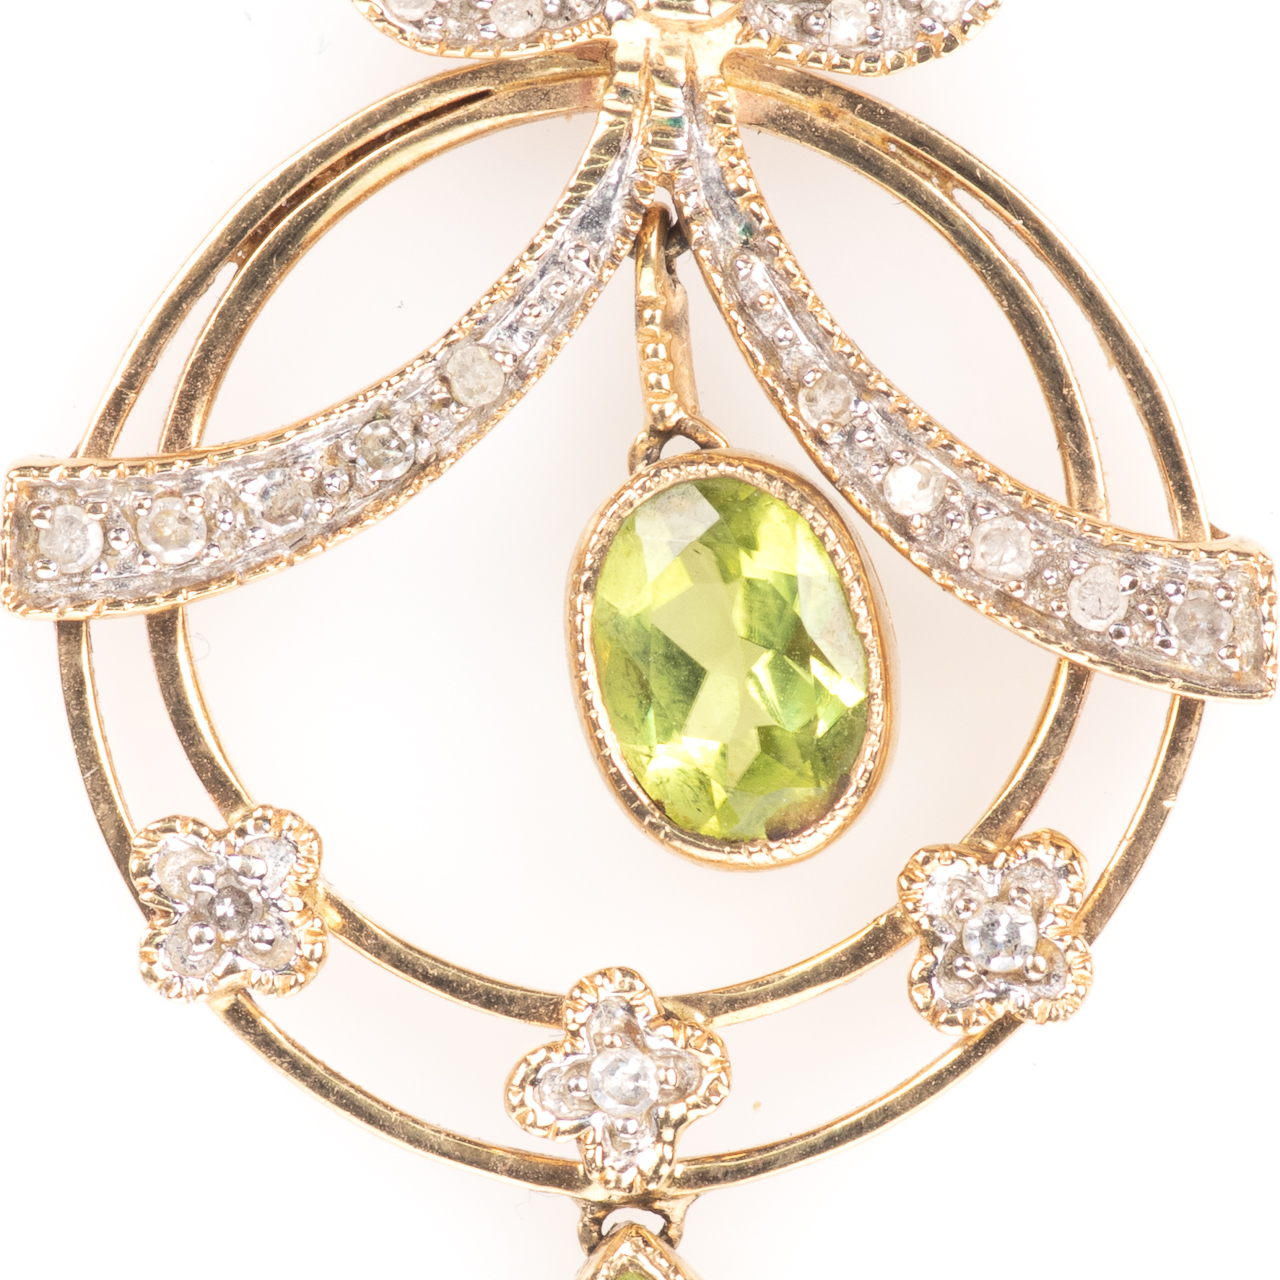 9ct Gold Art Nouveau Peridot & Diamond Pendant - Image 3 of 6